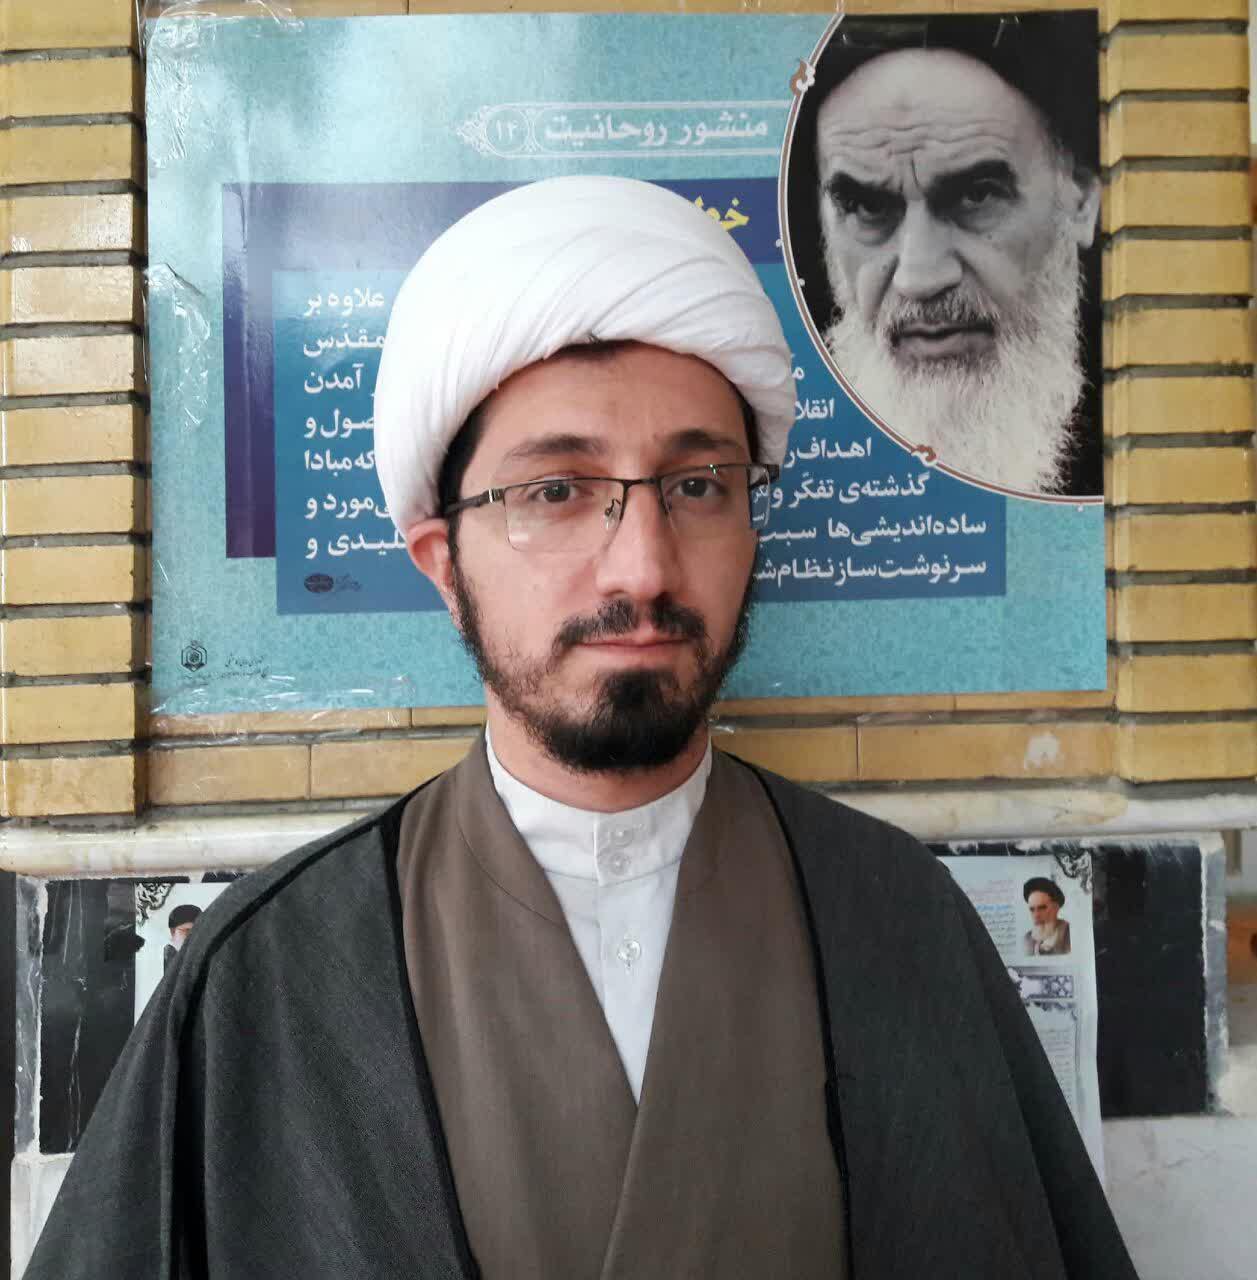 حجت الاسلام مقداد یعقوبی مدیر مدرسه علمیه باقرالعلوم(ع) سرپل ذهاب